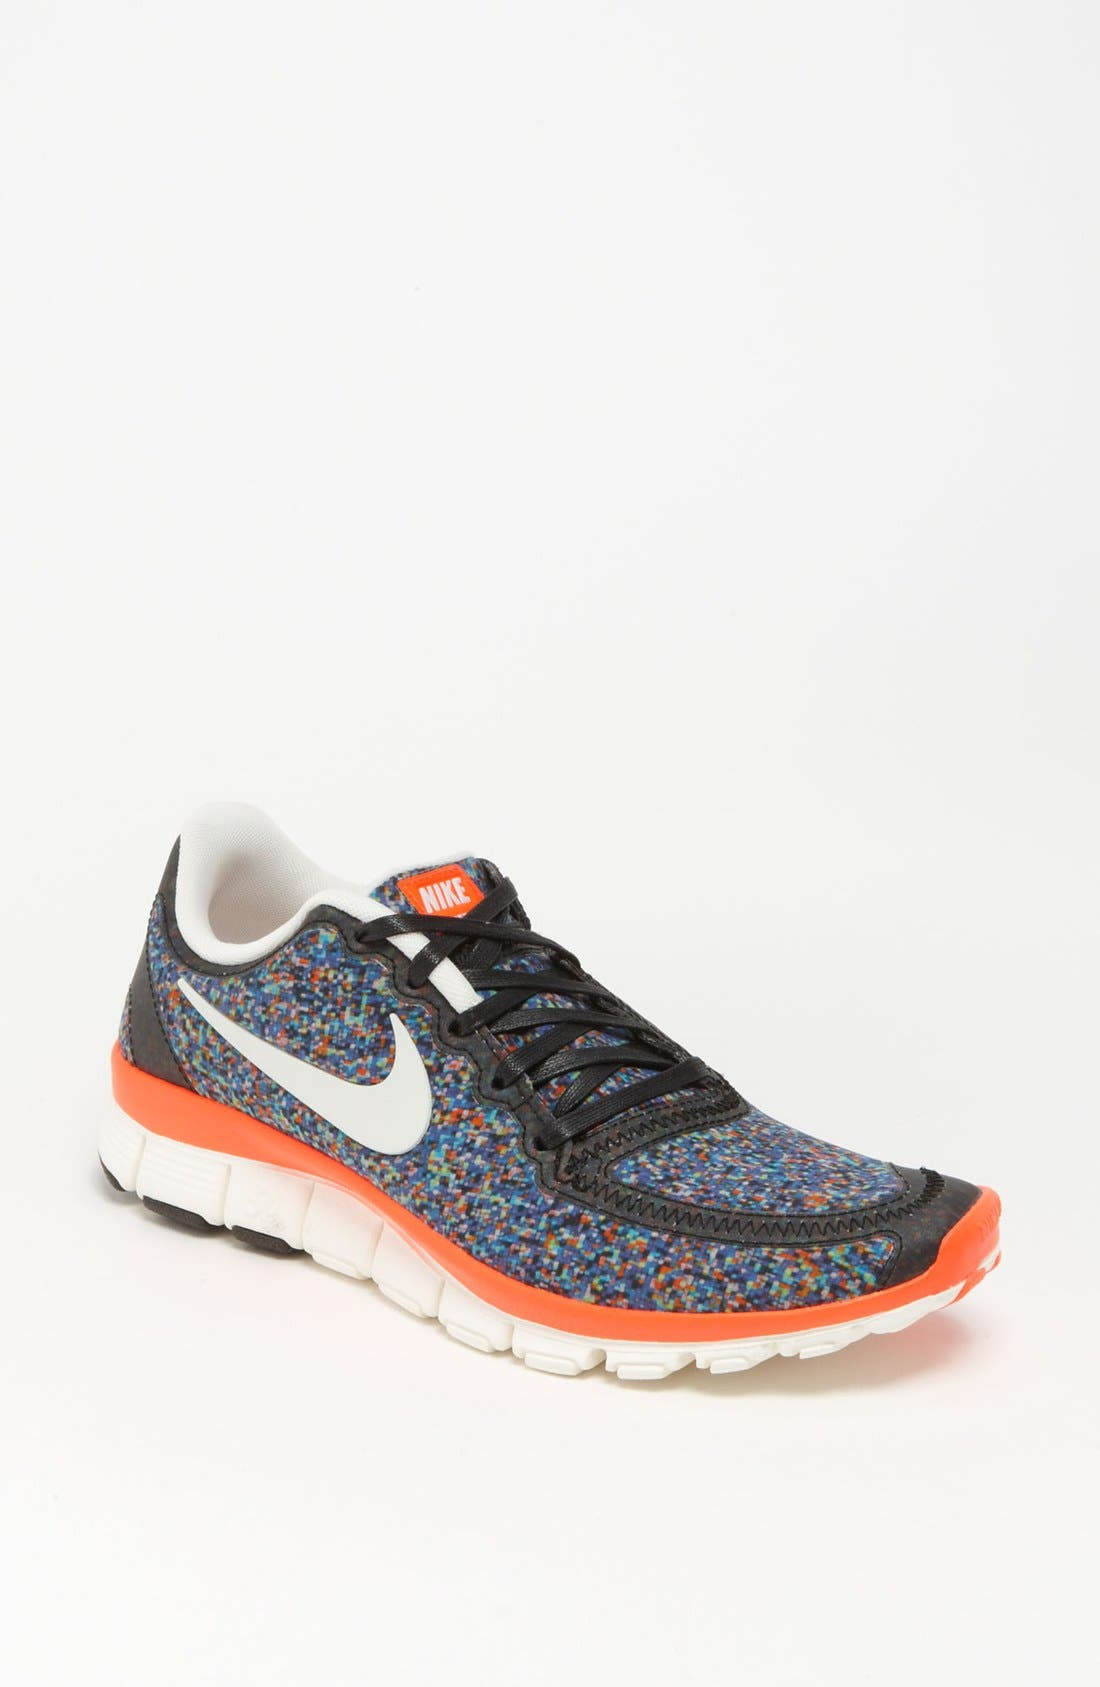 Alternate Image 1 Selected - Nike 'Free 5.0 Liberty' Sneaker (Women)